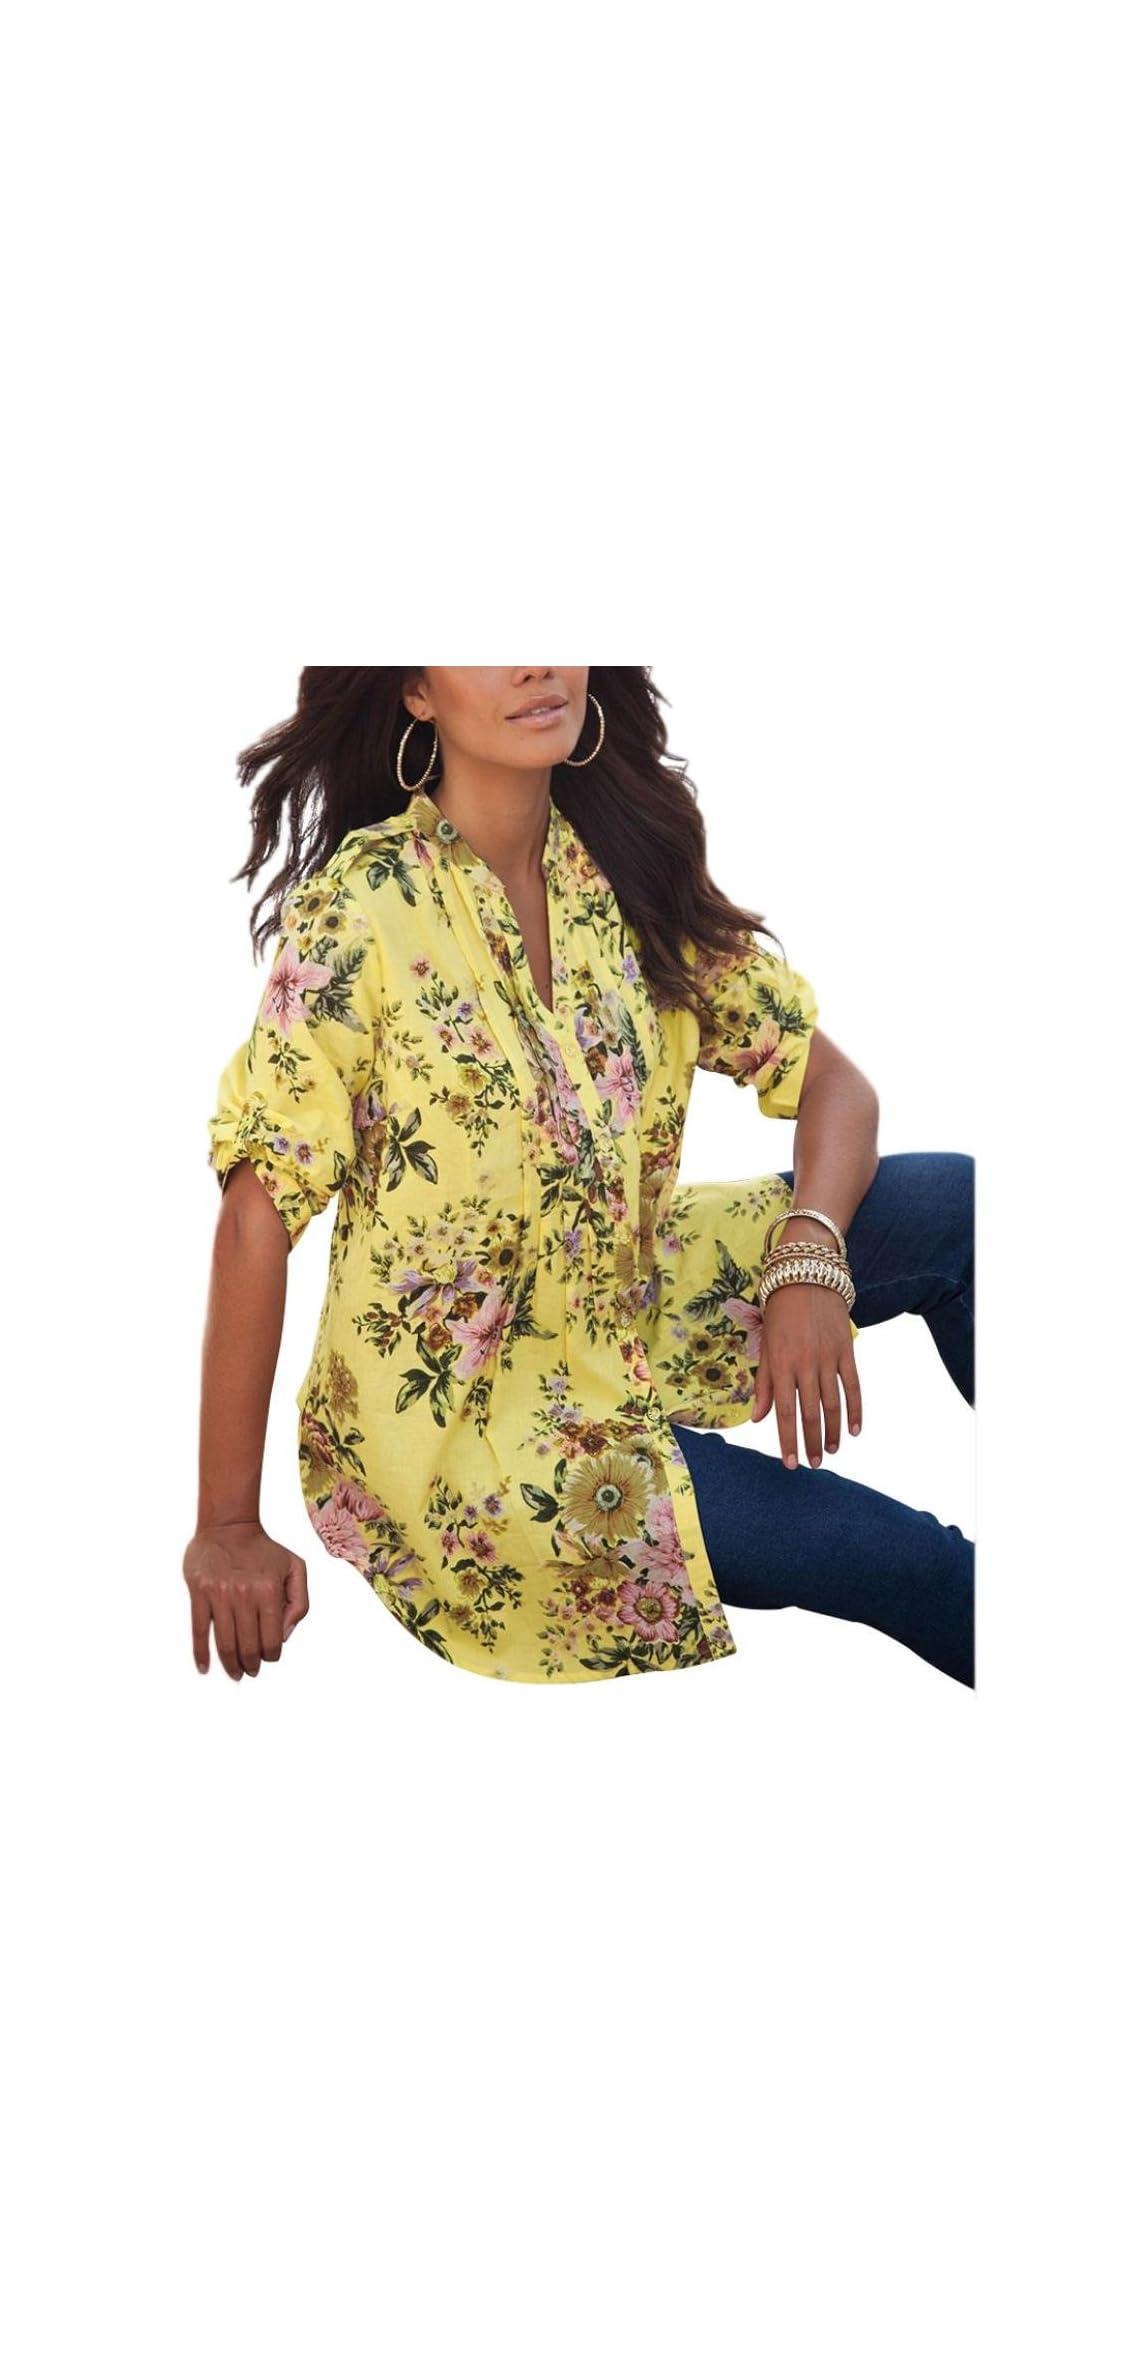 Zyooh Plus Size Blouse, Autumn Vintage Floral Printed V-neck /